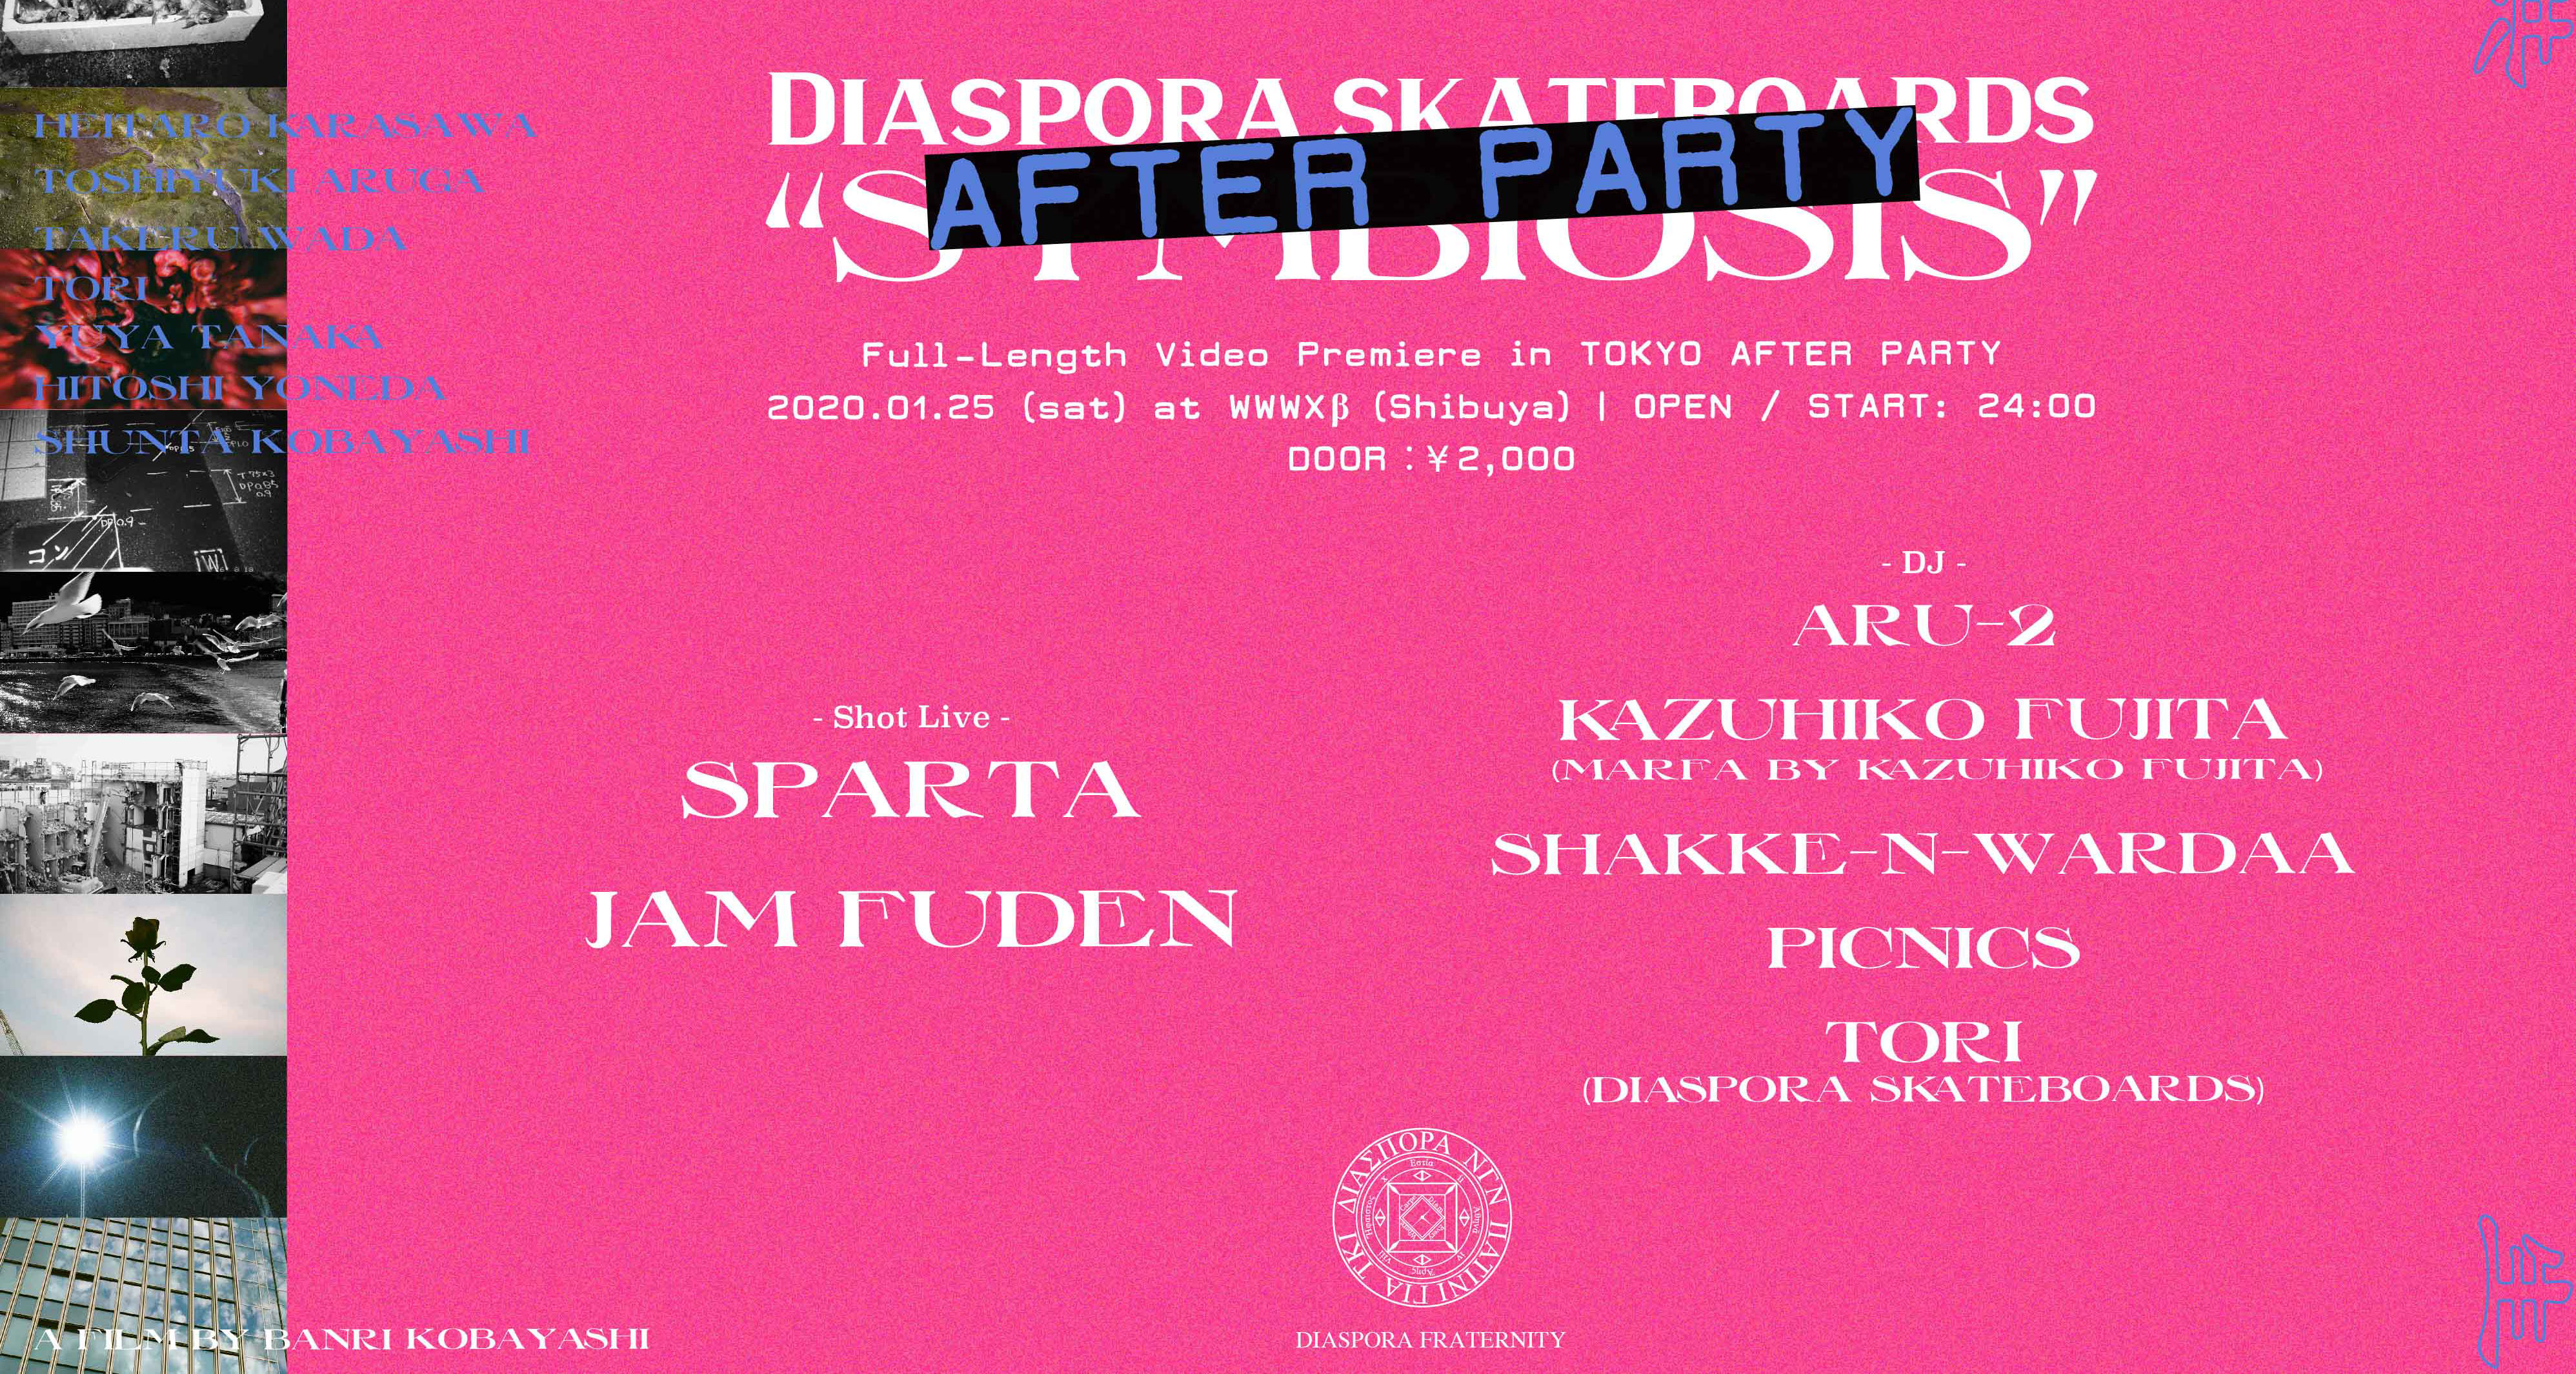 SPARTA / JAM FUDEN / Aru-2 / Kazuhiko Fujita(Marfa by Kazuhiko Fujita) / shakke-n-wardaa / Picnics / TORI(Diaspora skateboards)